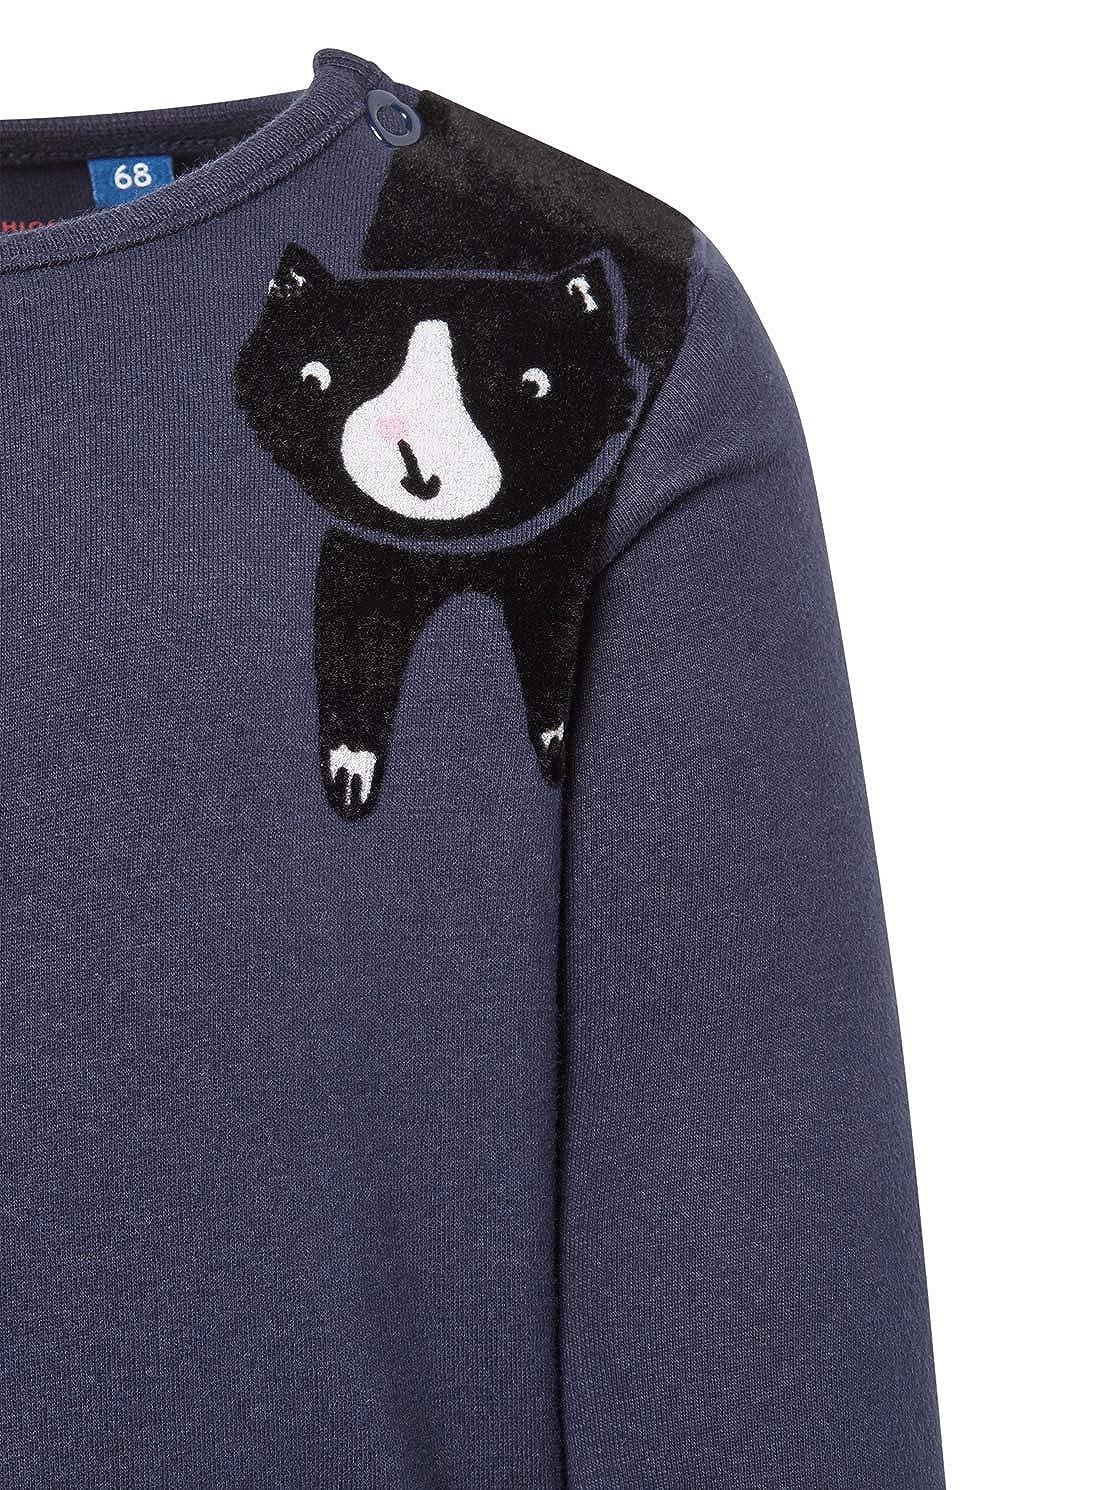 TOM TAILOR f/ür M/ädchen T-Shirts//Tops Langarmshirt mit Katzen-Print